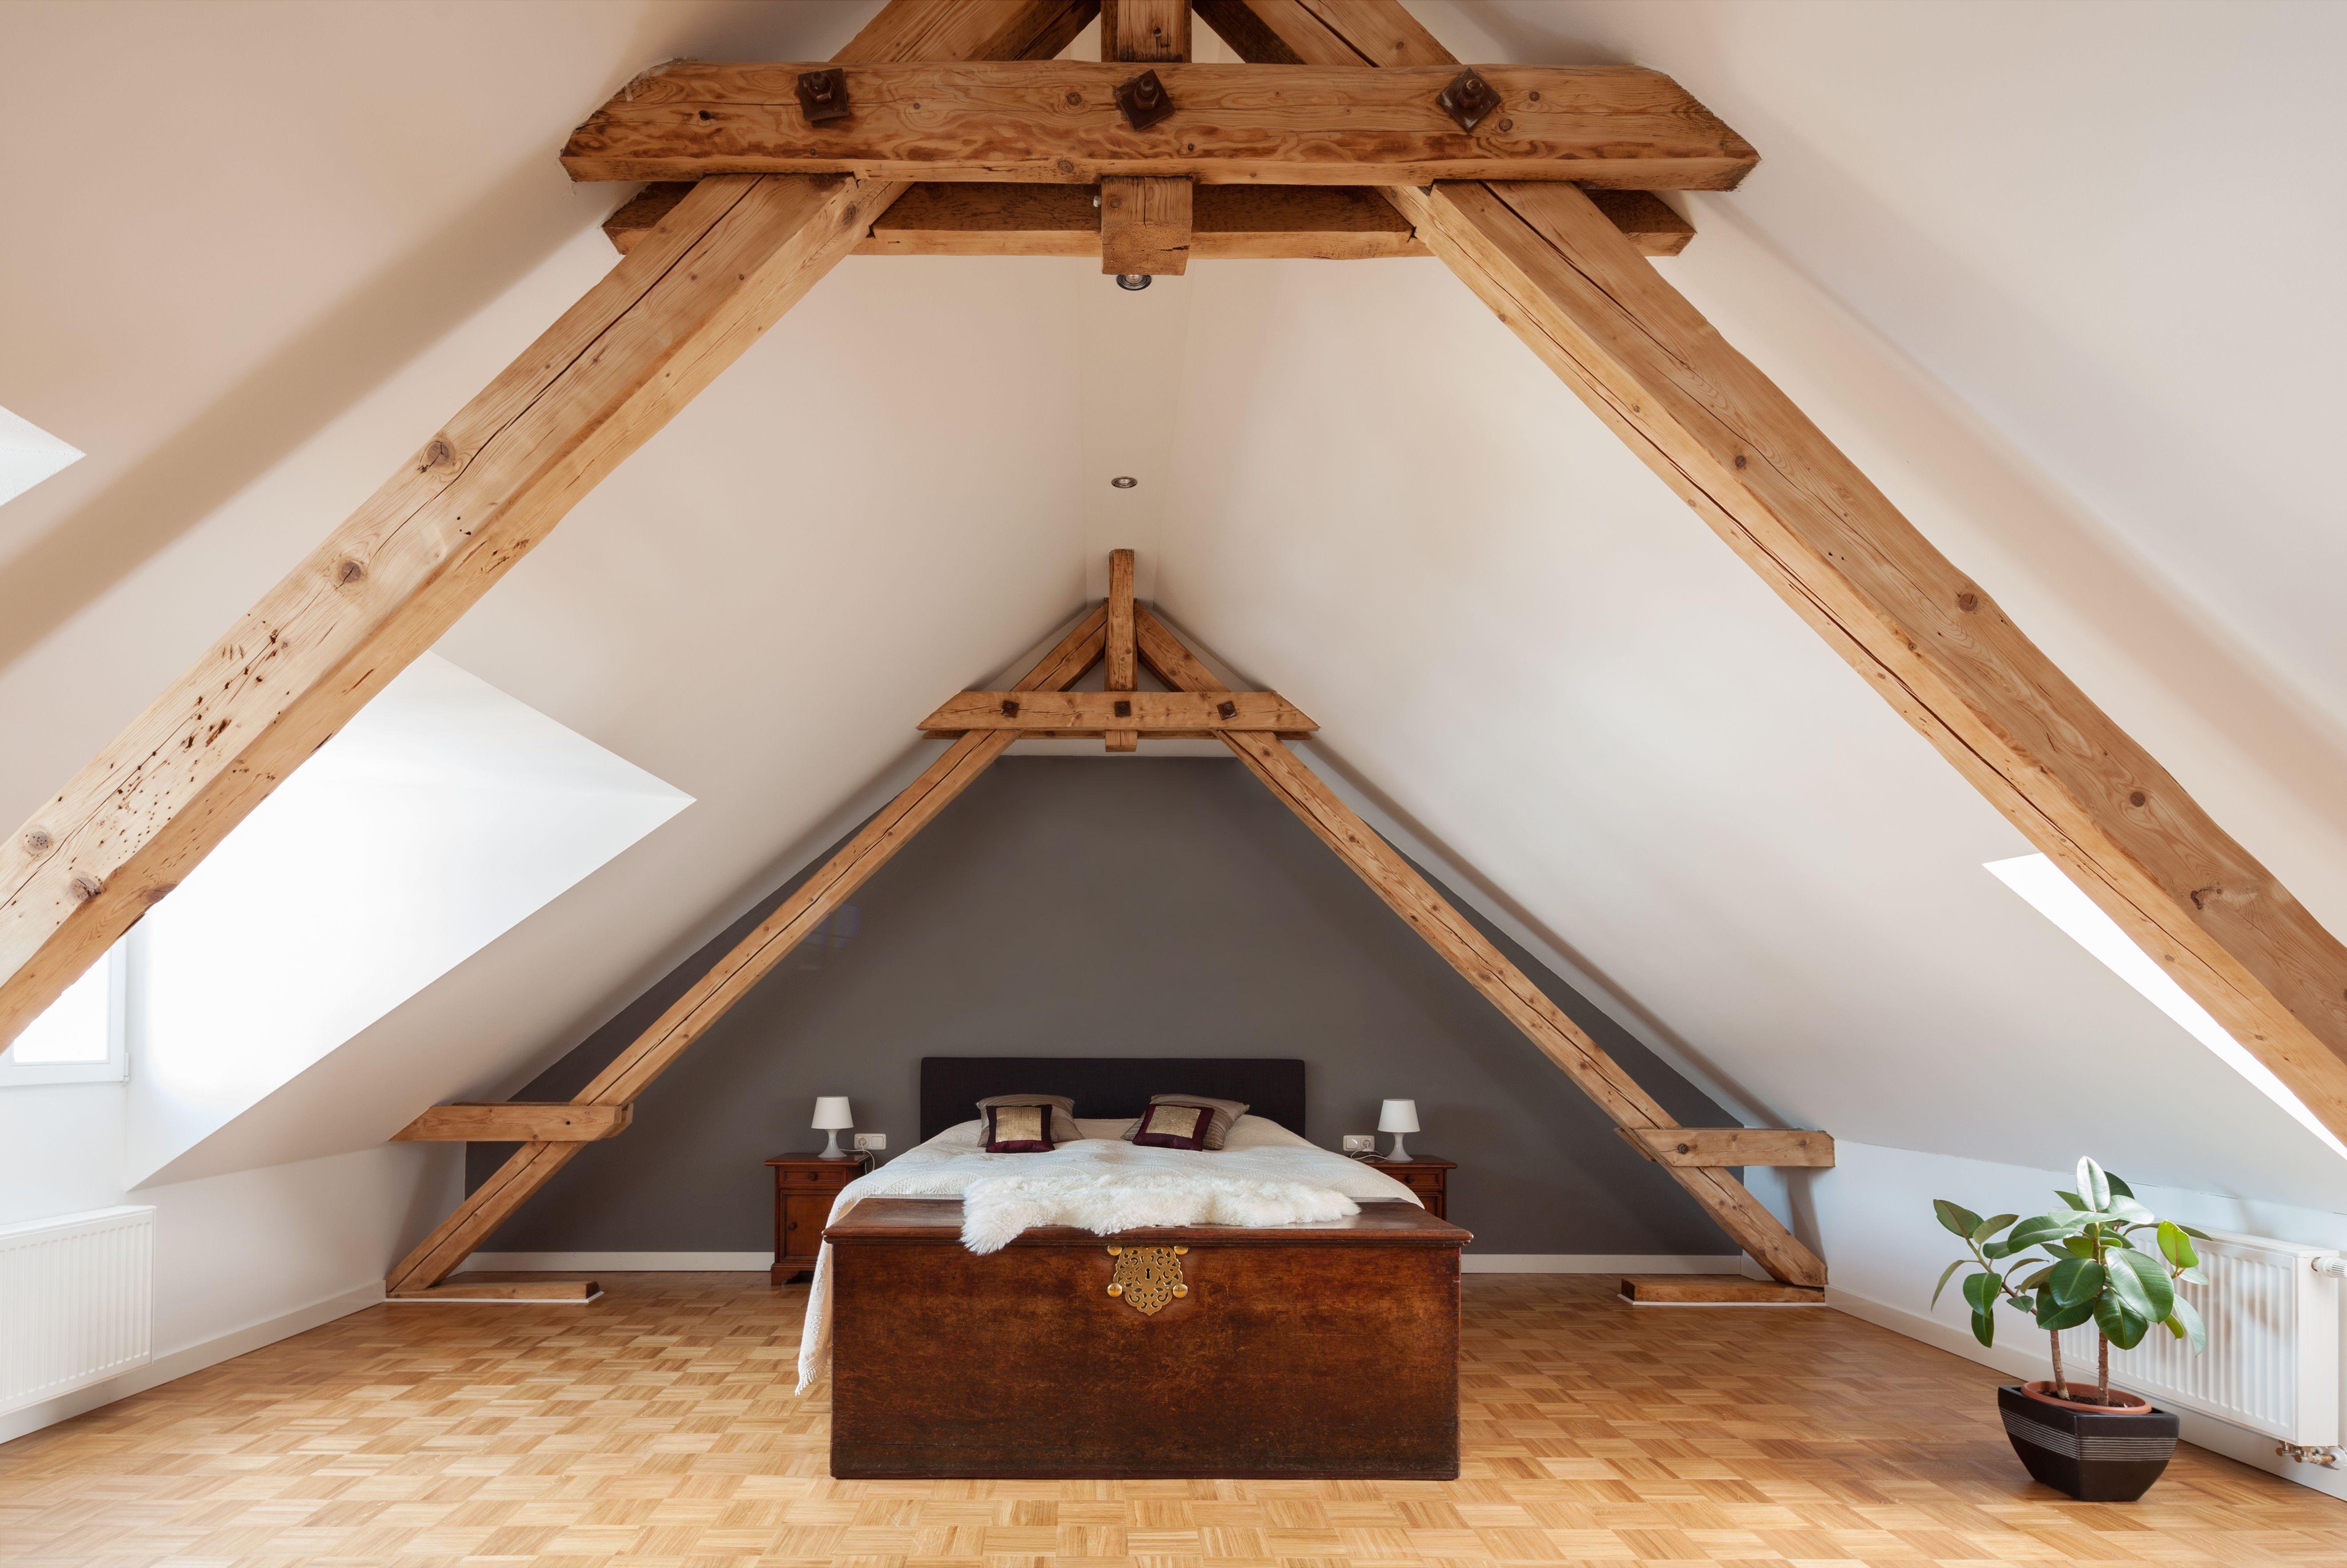 Dormer Costs Different Types Of Dormers Modernize Roof Truss Design Dormer Bedroom Bedroom Design